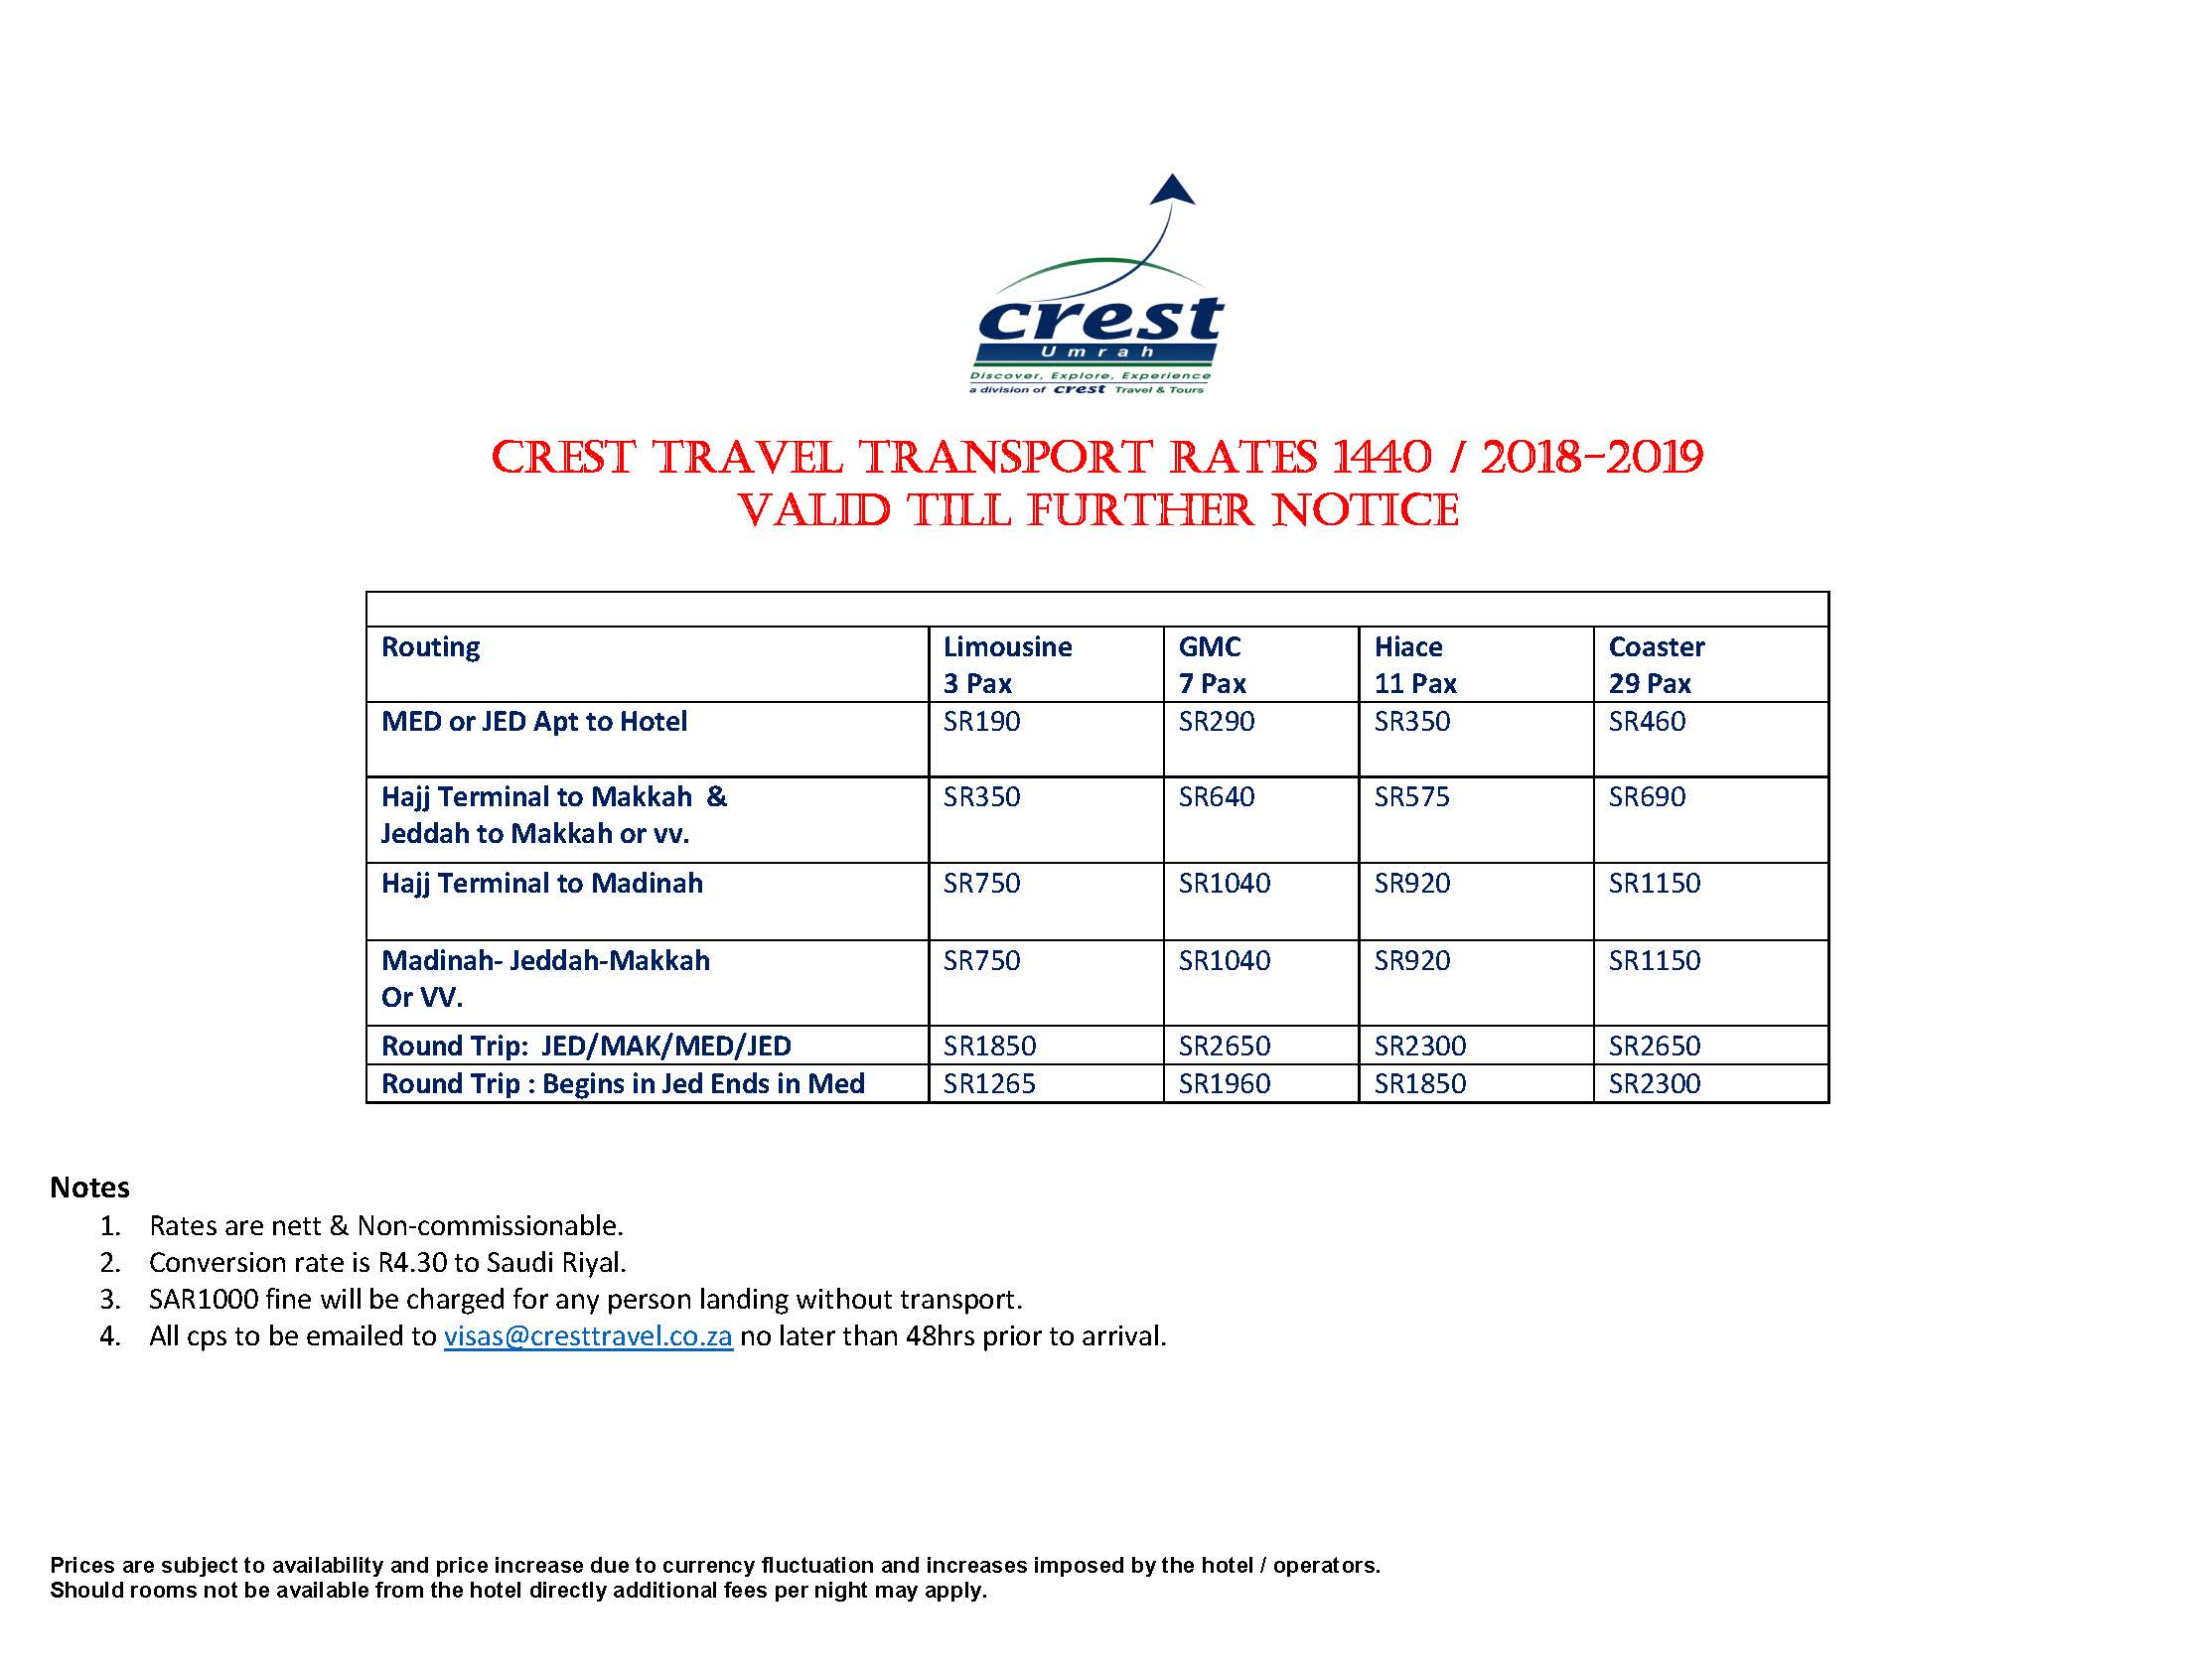 CREST 1440 TRANSPORT RATES